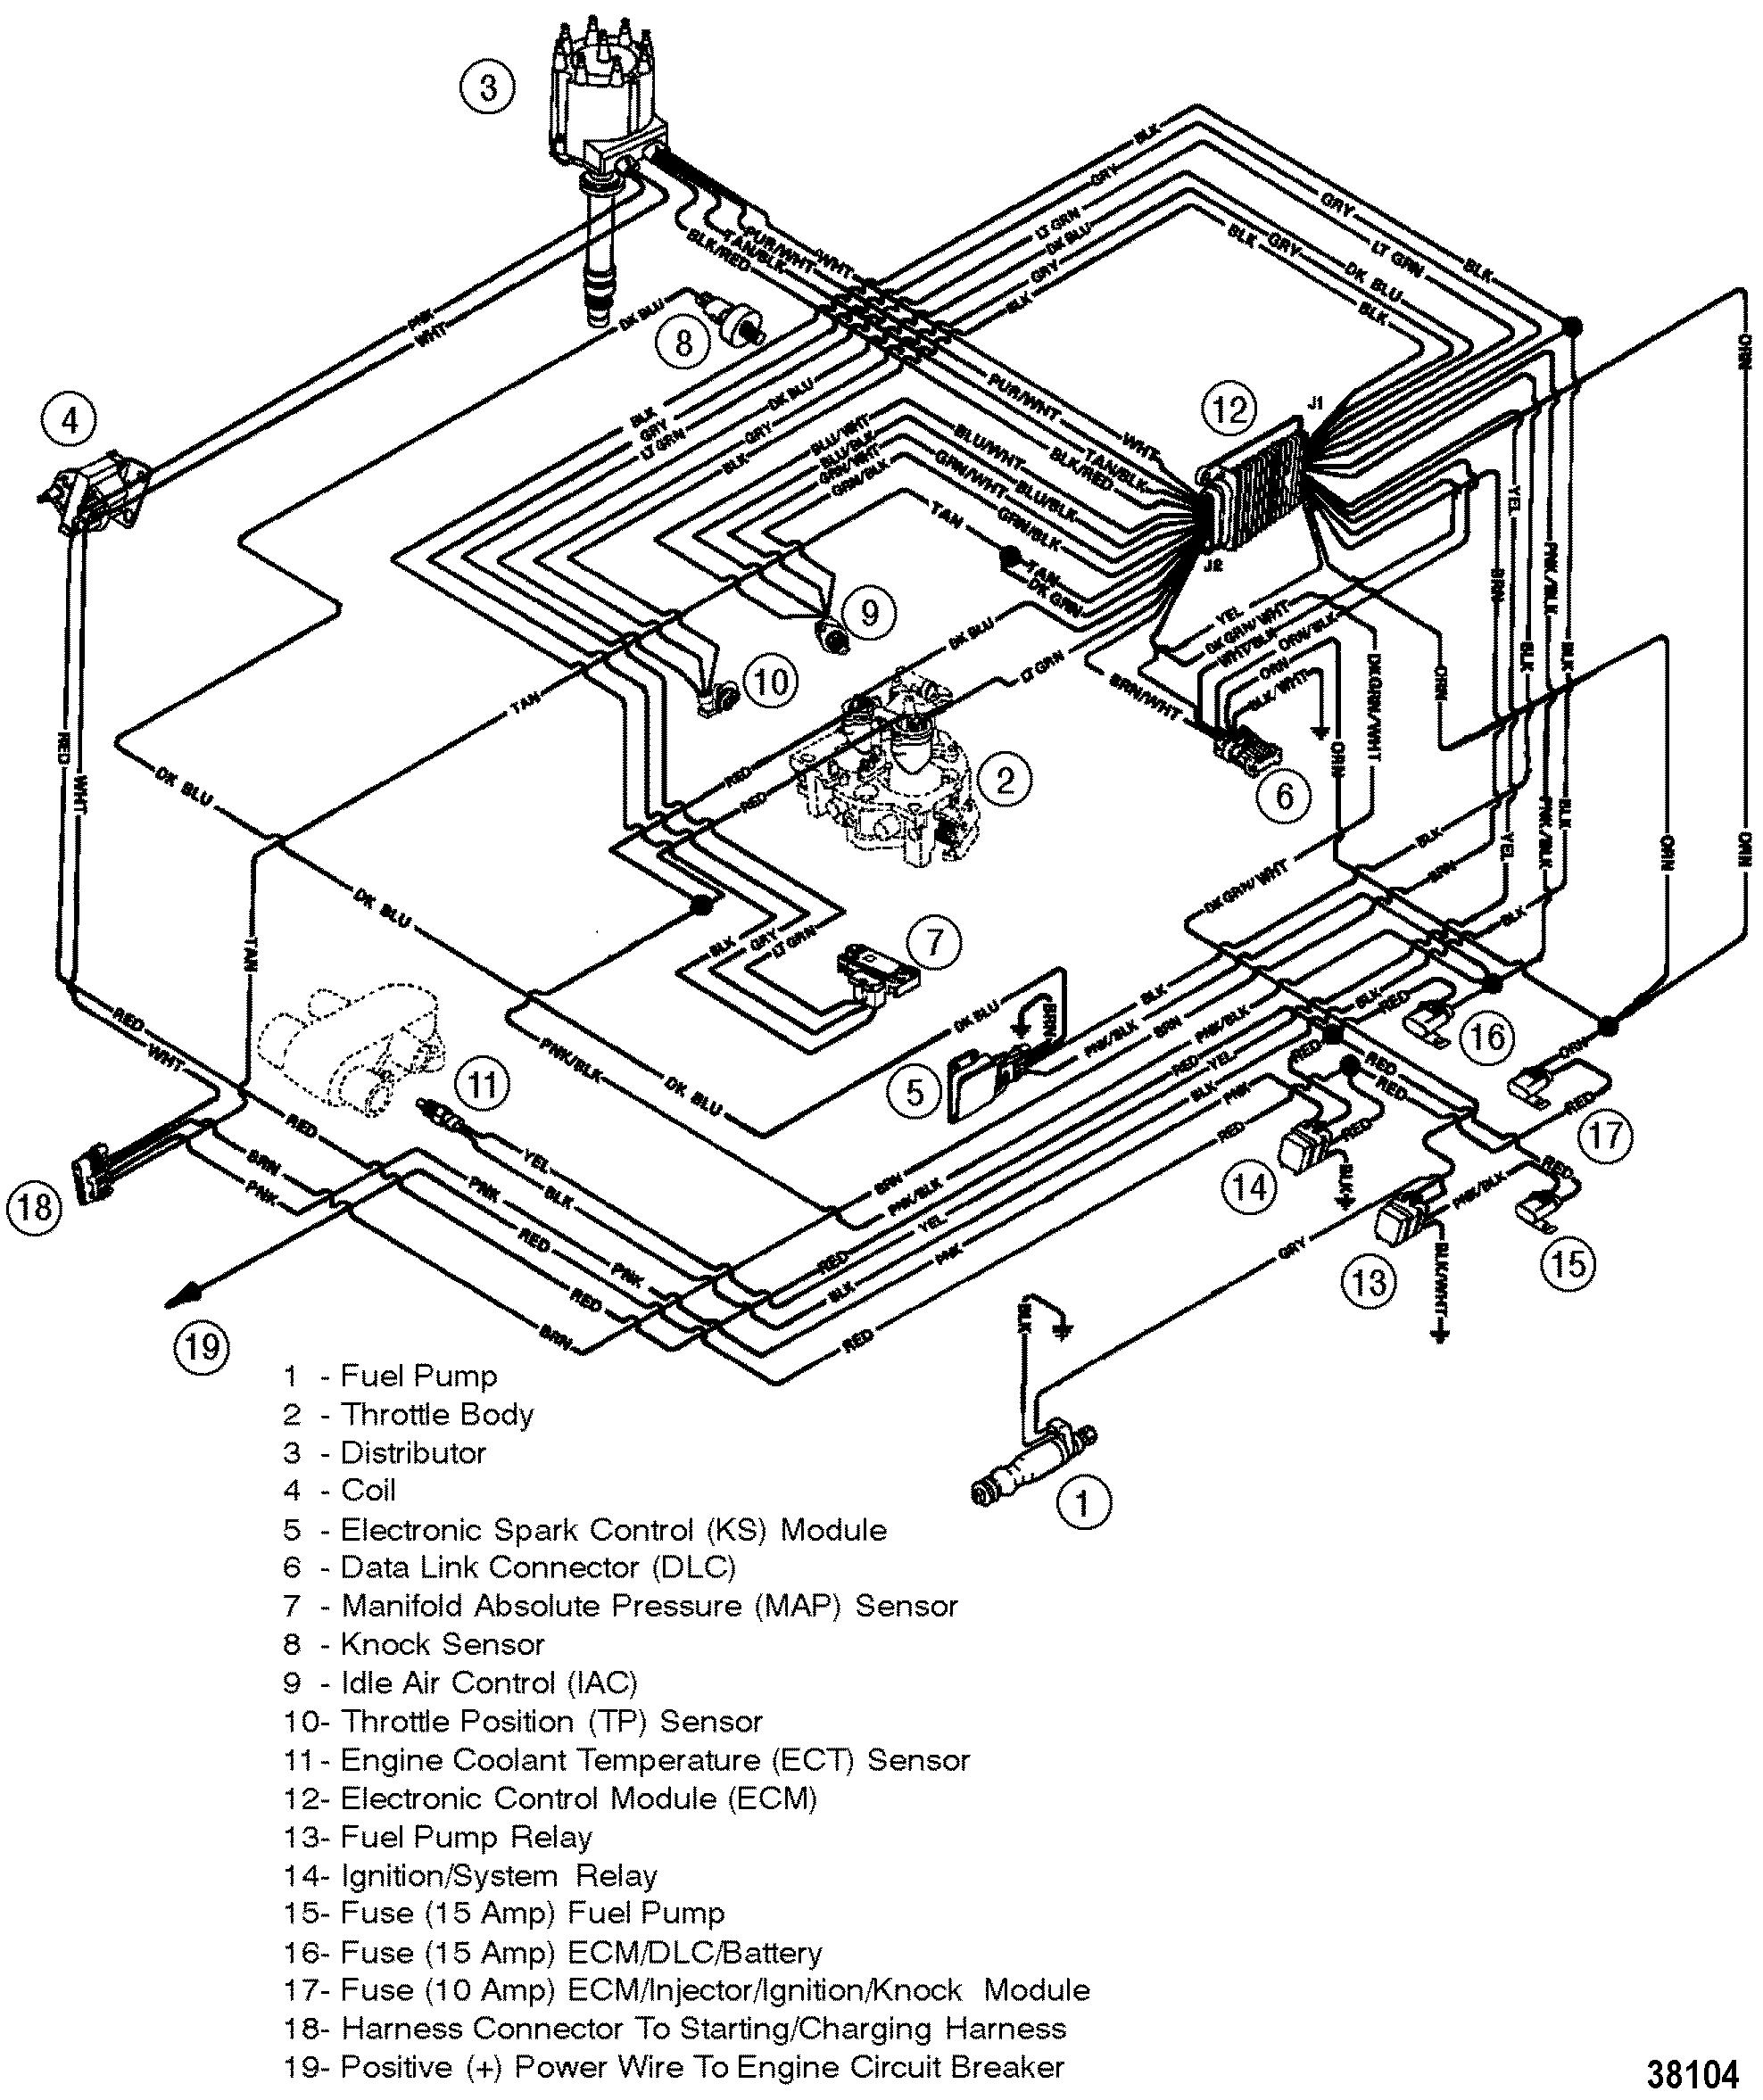 Chevy 5 7 Tbi Engine Diagram